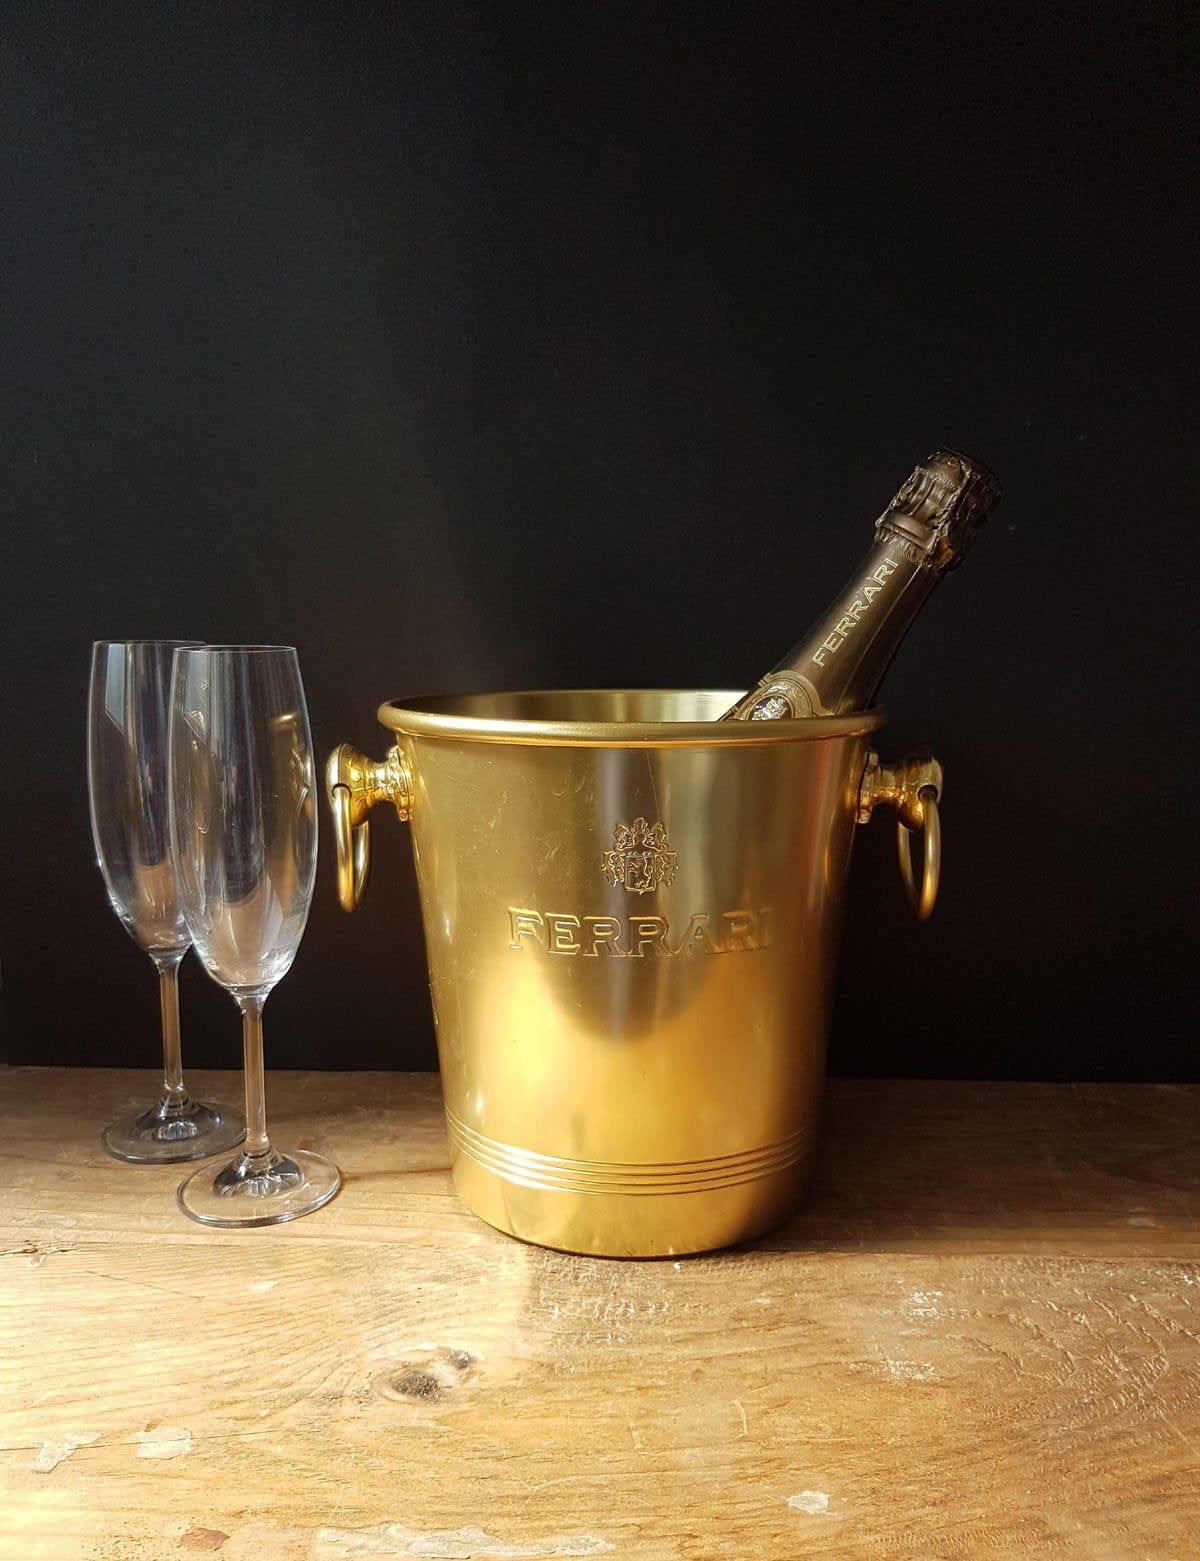 Vintage Italian Ferrari Champagne Bucket Gold Metal Champagne Bucket Ice Bucket Wine Champagne Buck Champagne Buckets Barware Accessories Wine Ice Bucket